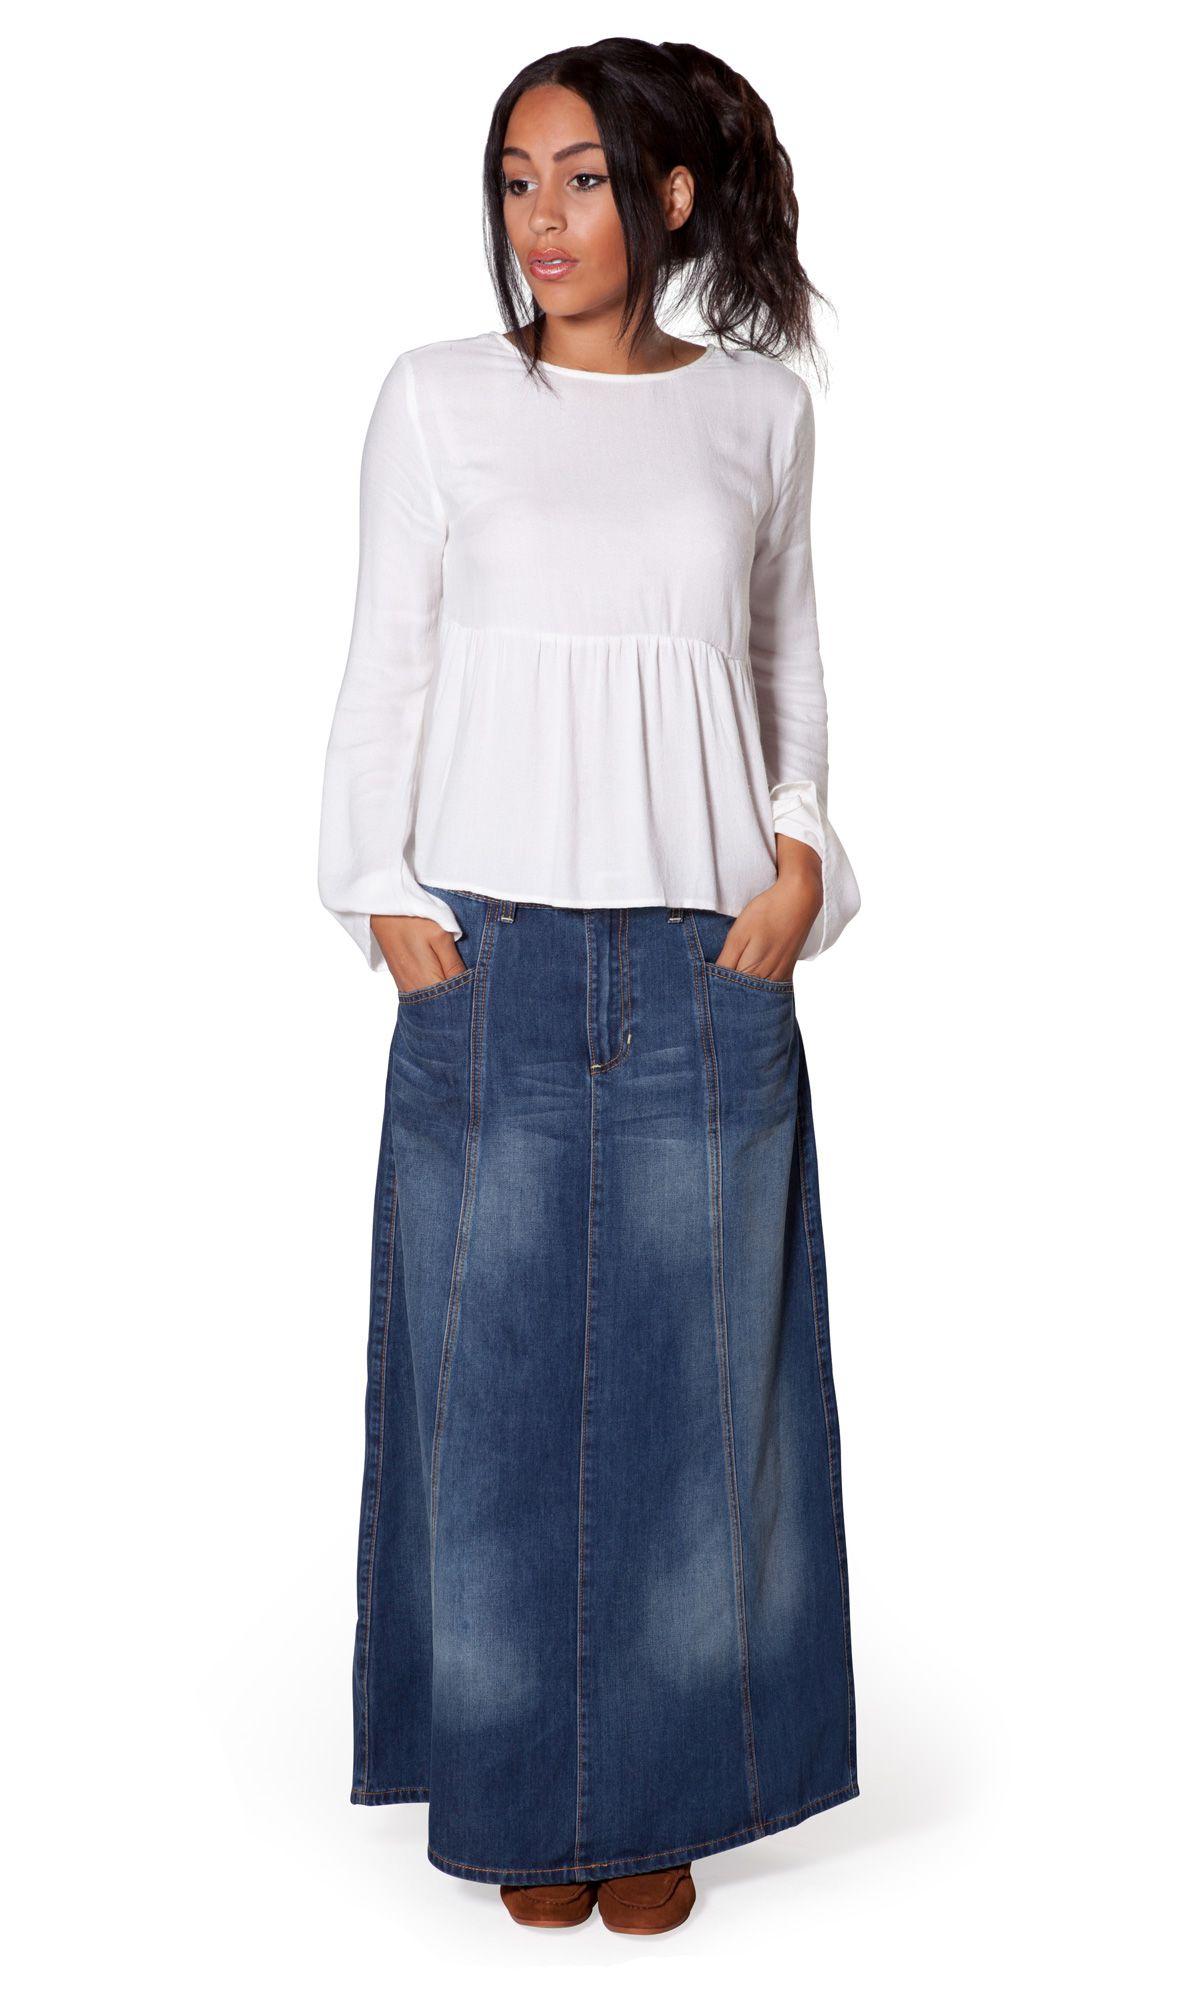 Love this USKEES Janice Denim Skirt - Medium weight faded Denim ...